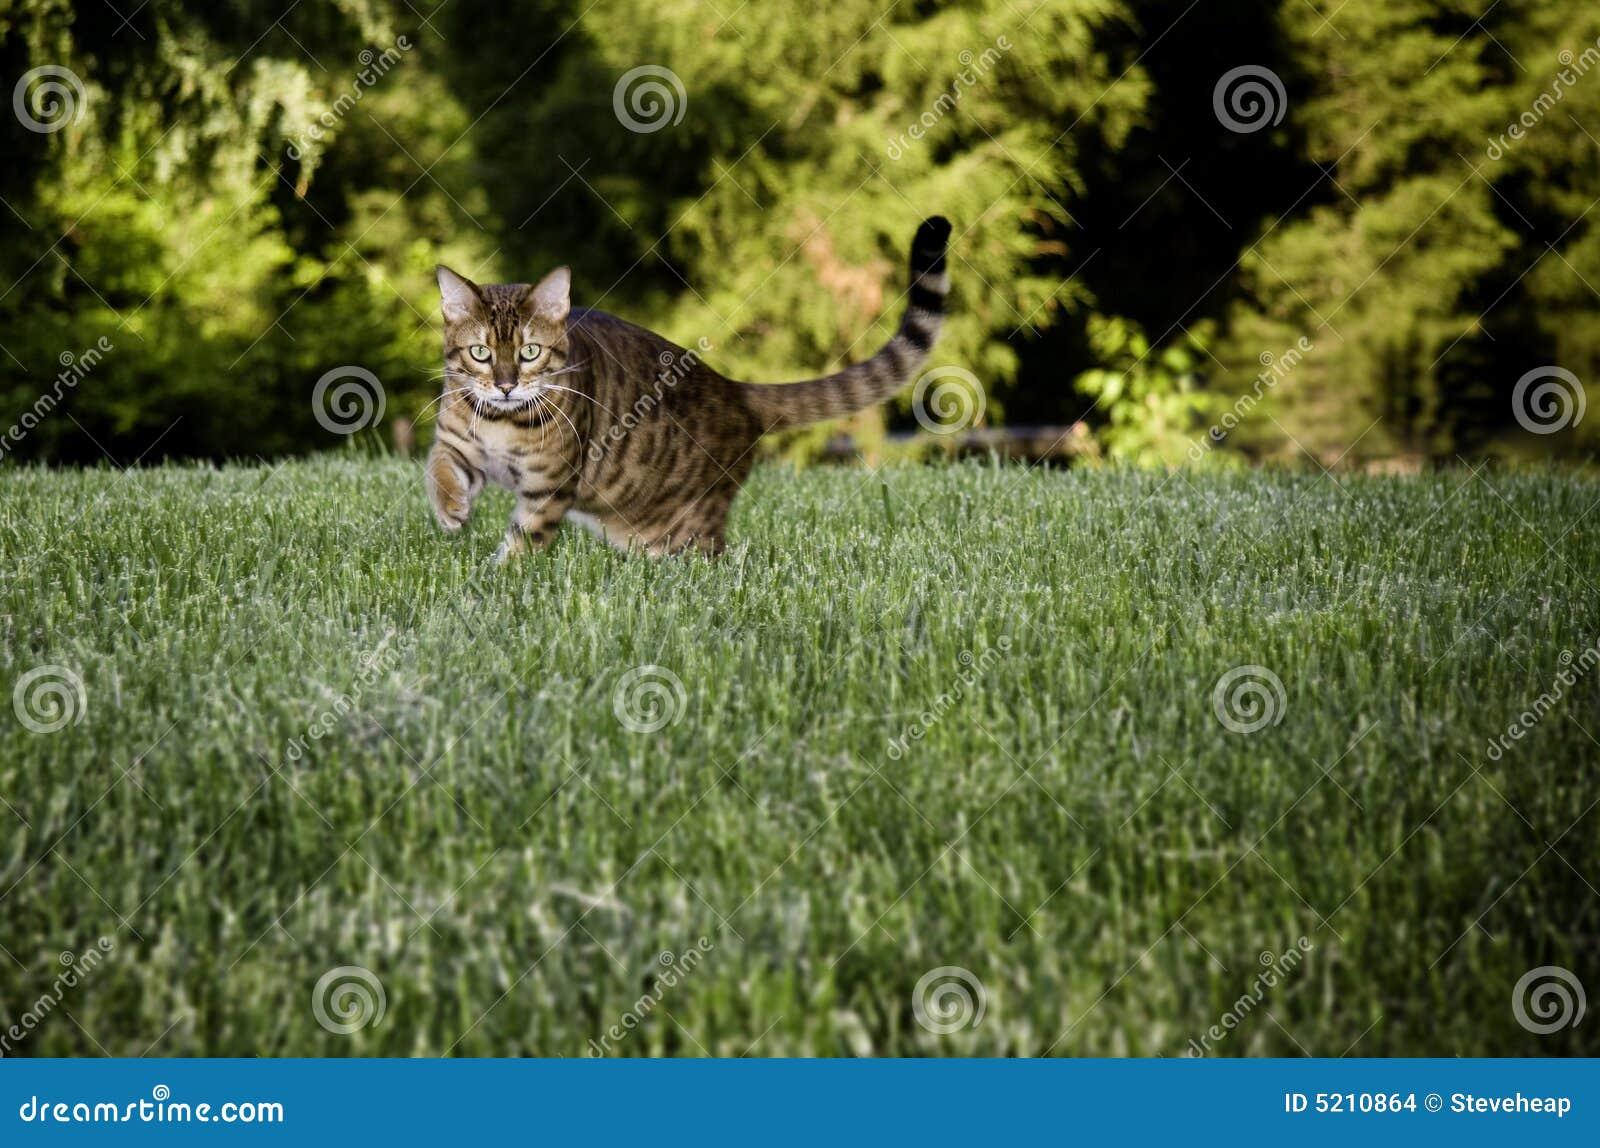 Bengal Cat in grass